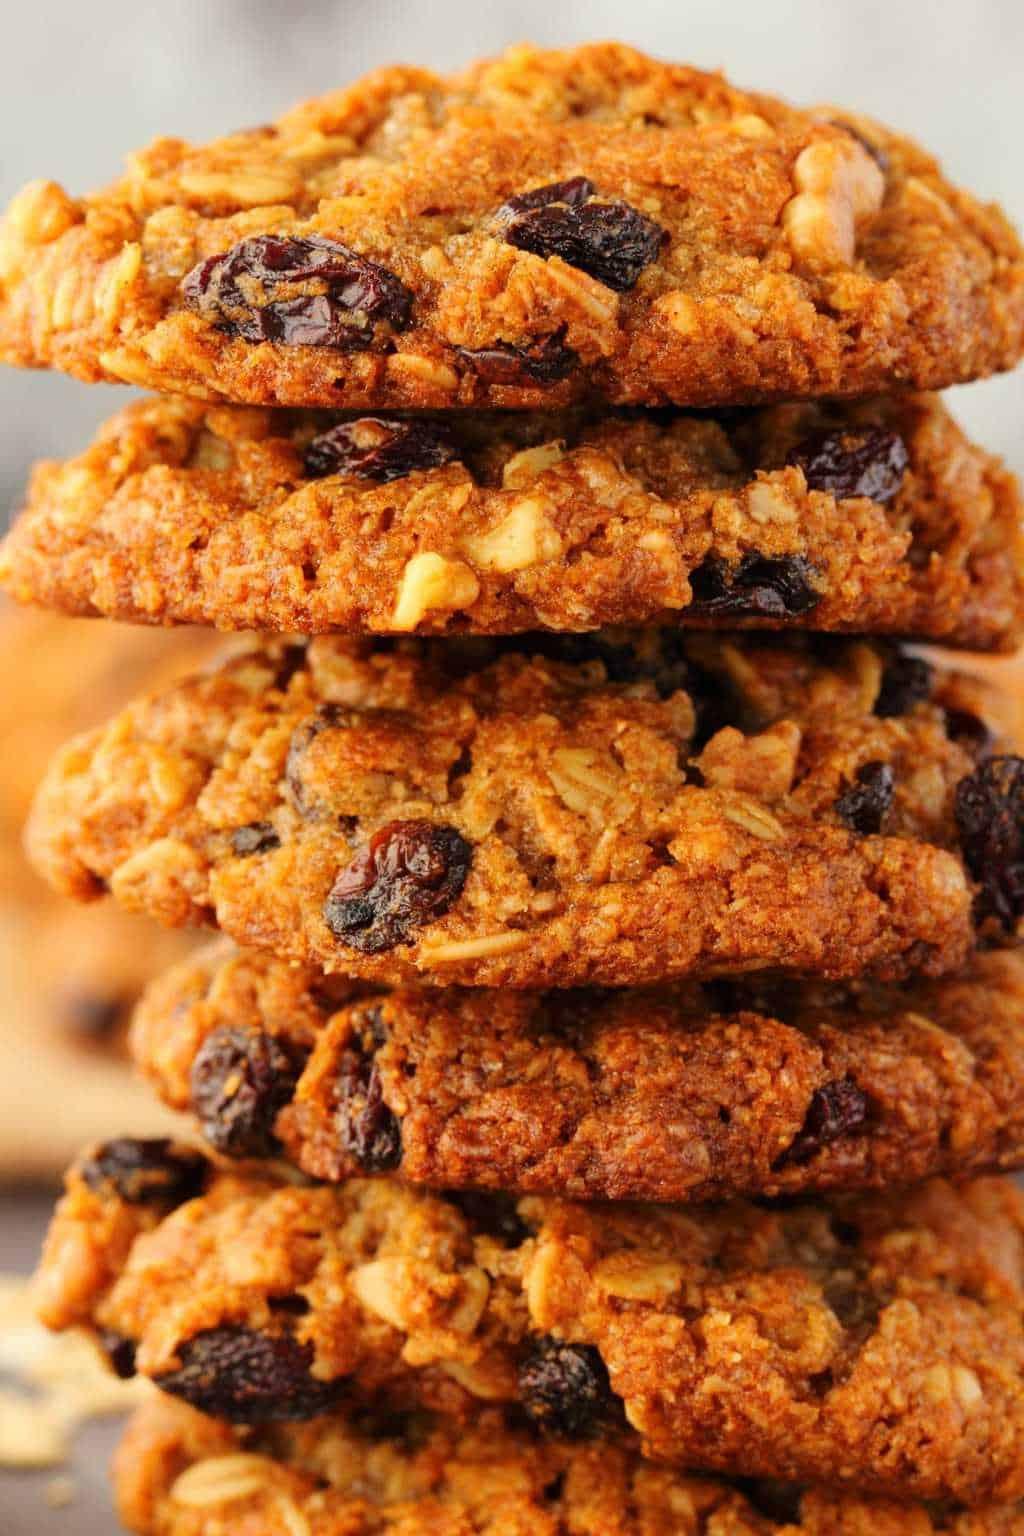 Vegan oatmeal raisin cookies in a stack.